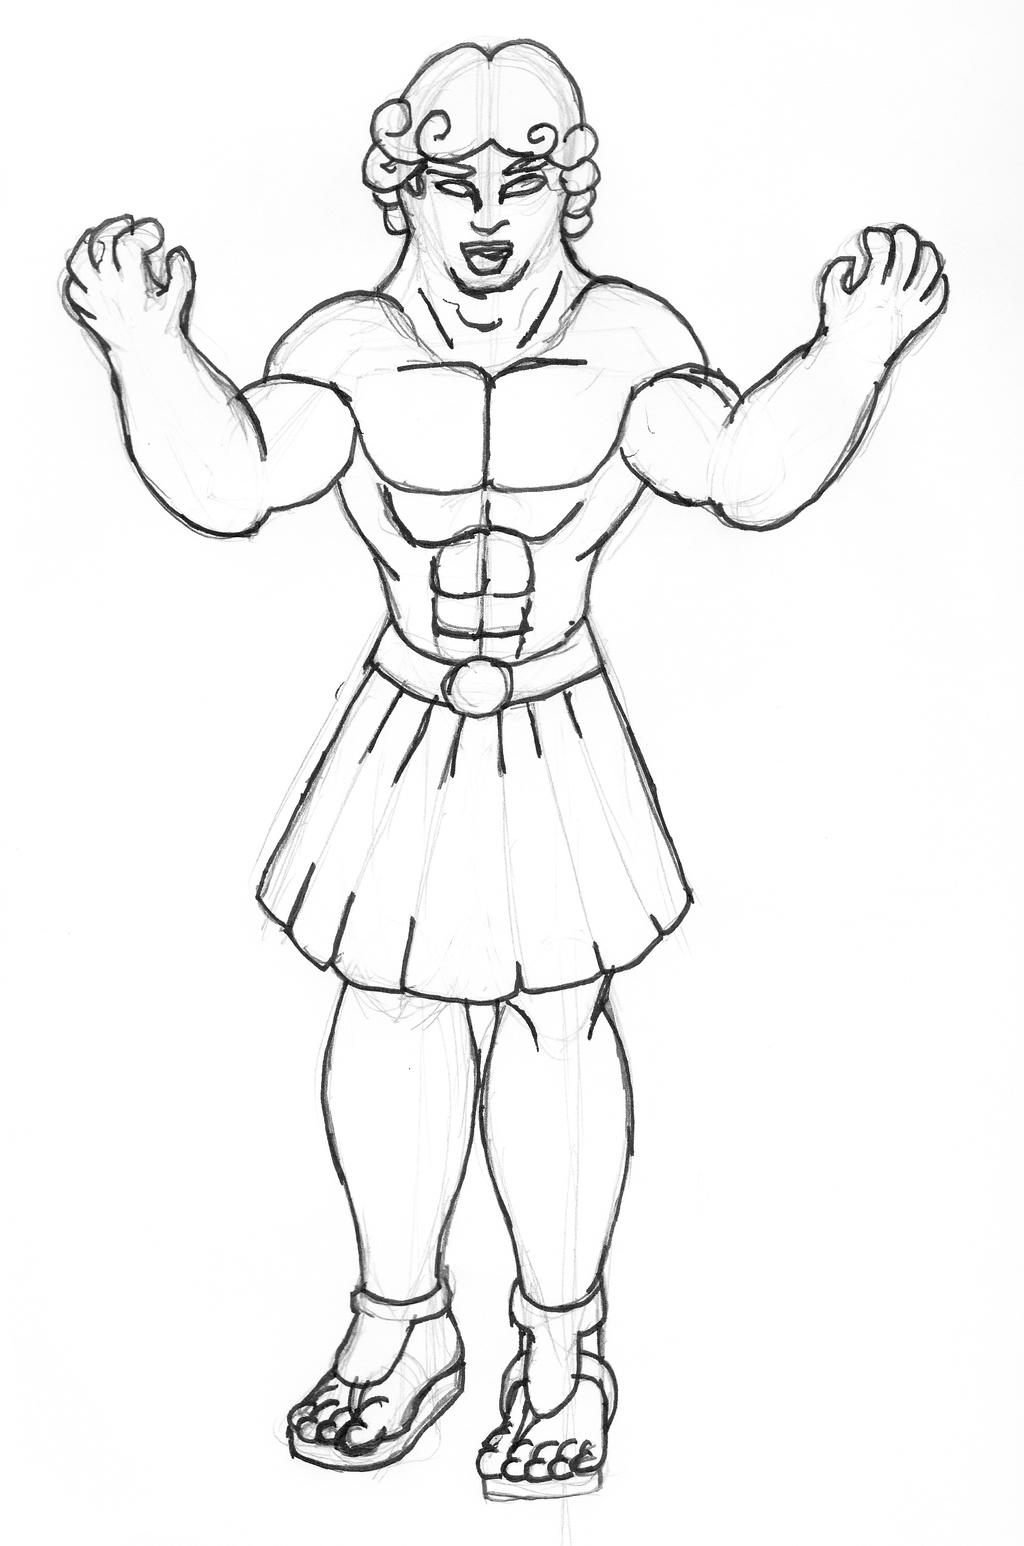 Alternate Demon Sketch - Atlas by Bhurloka12